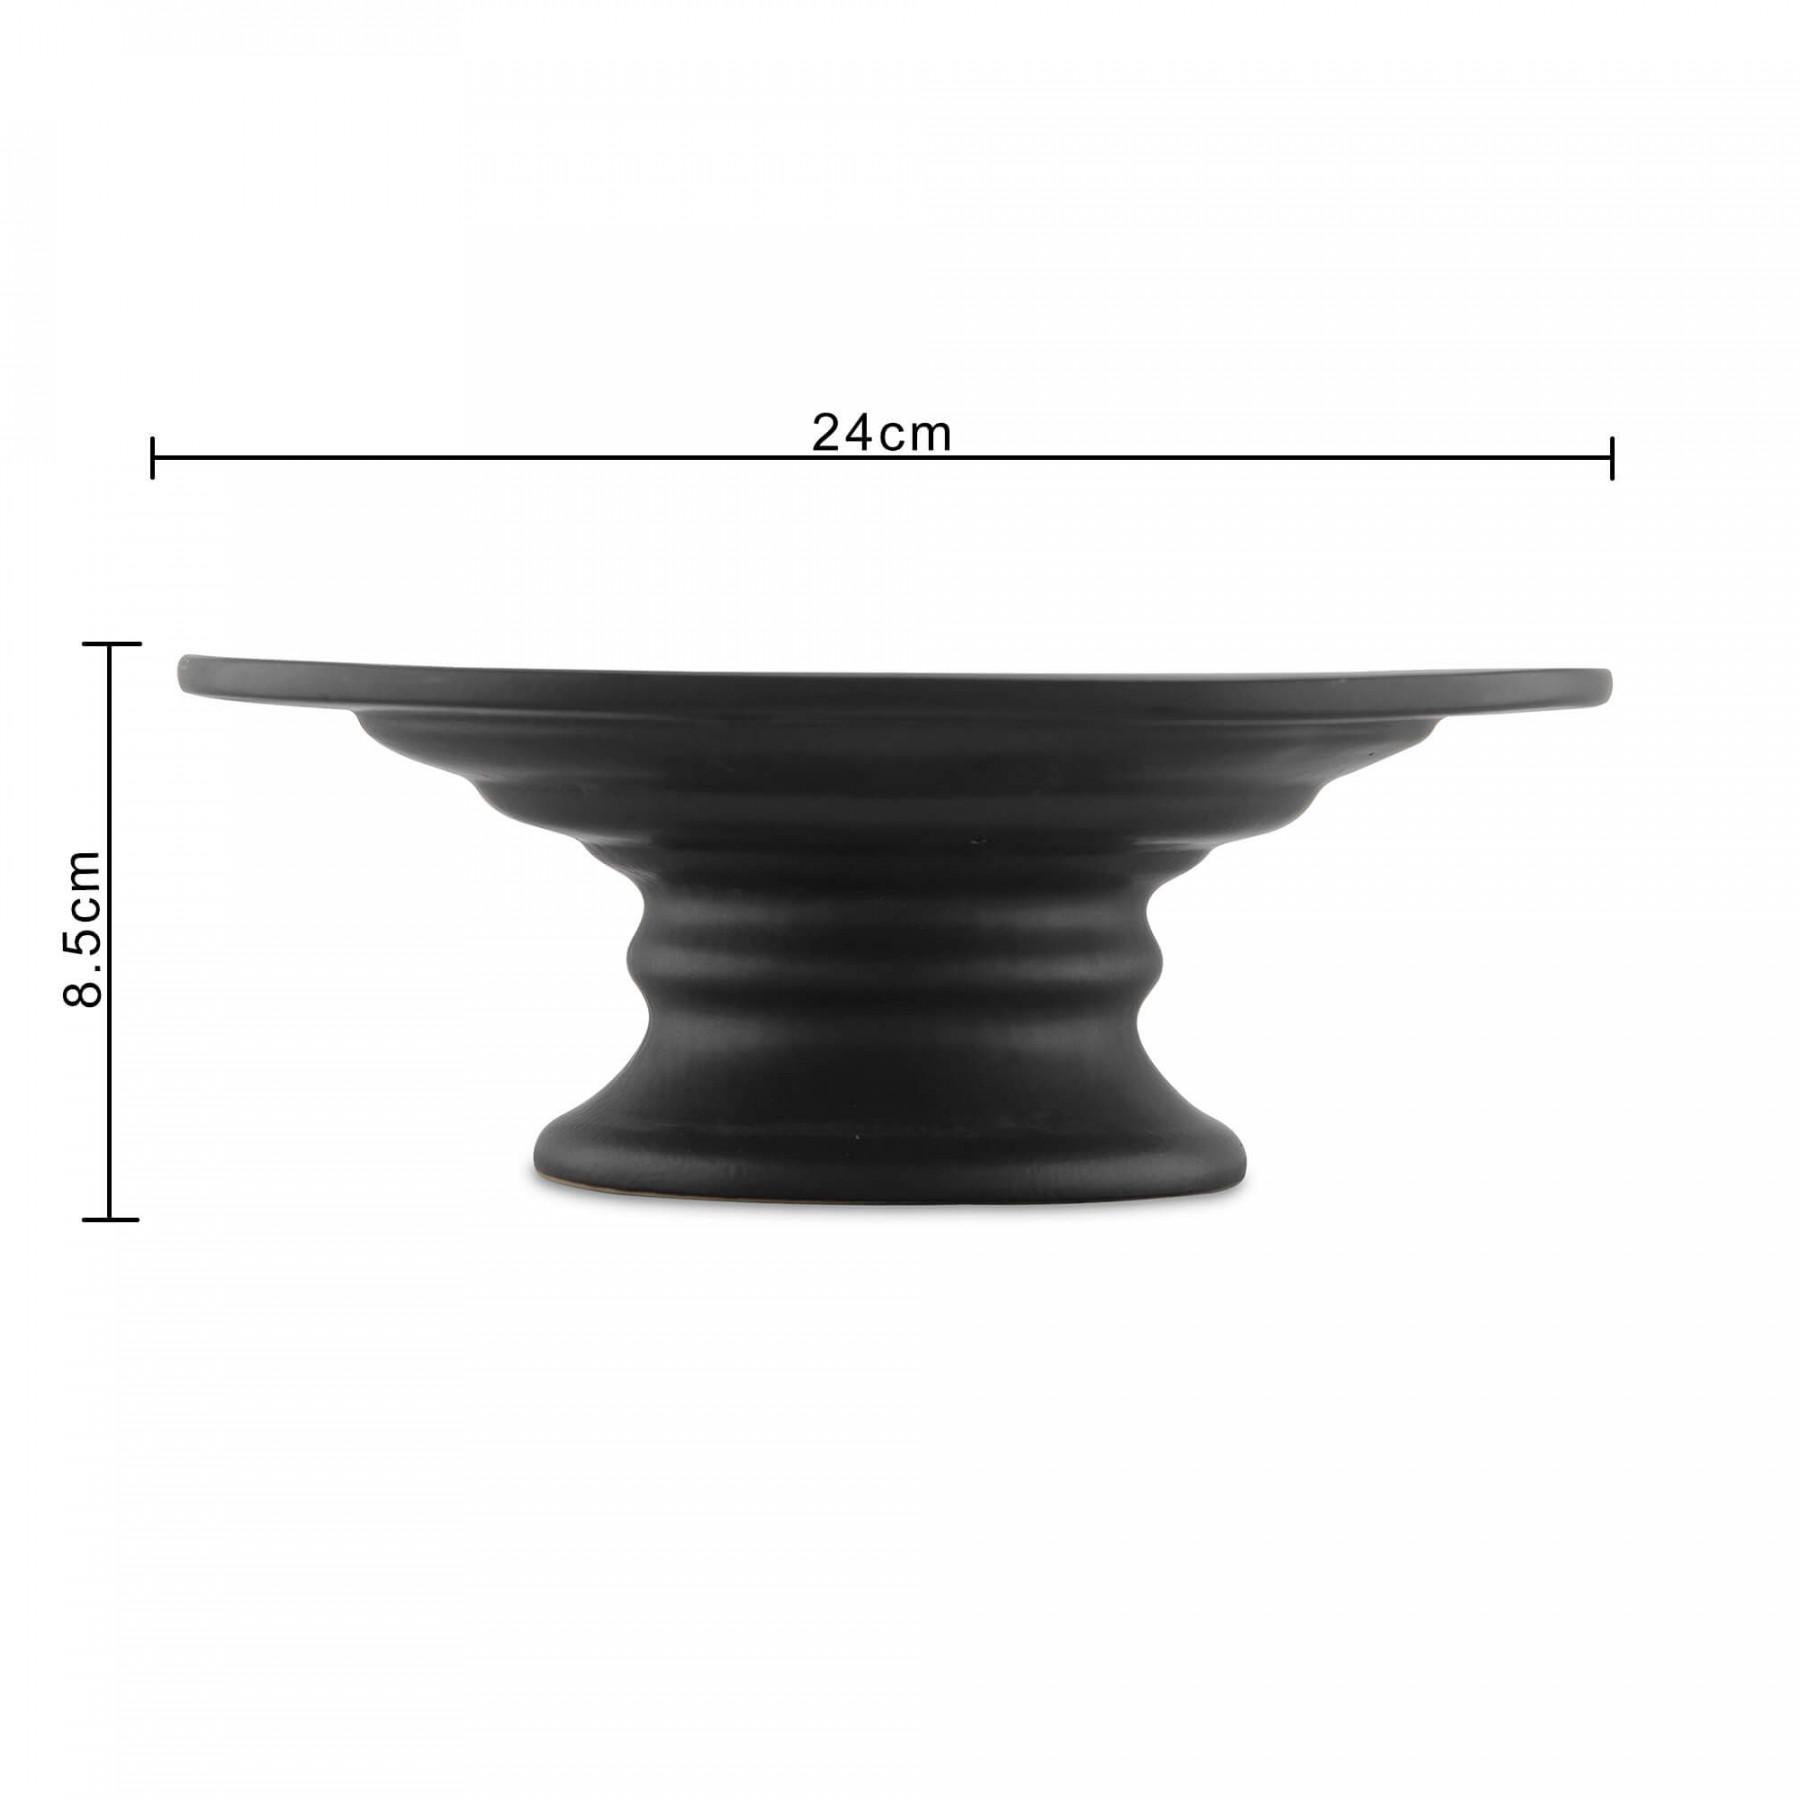 10 Inch Round Ceramic Cake And Dessert Pedestal Display